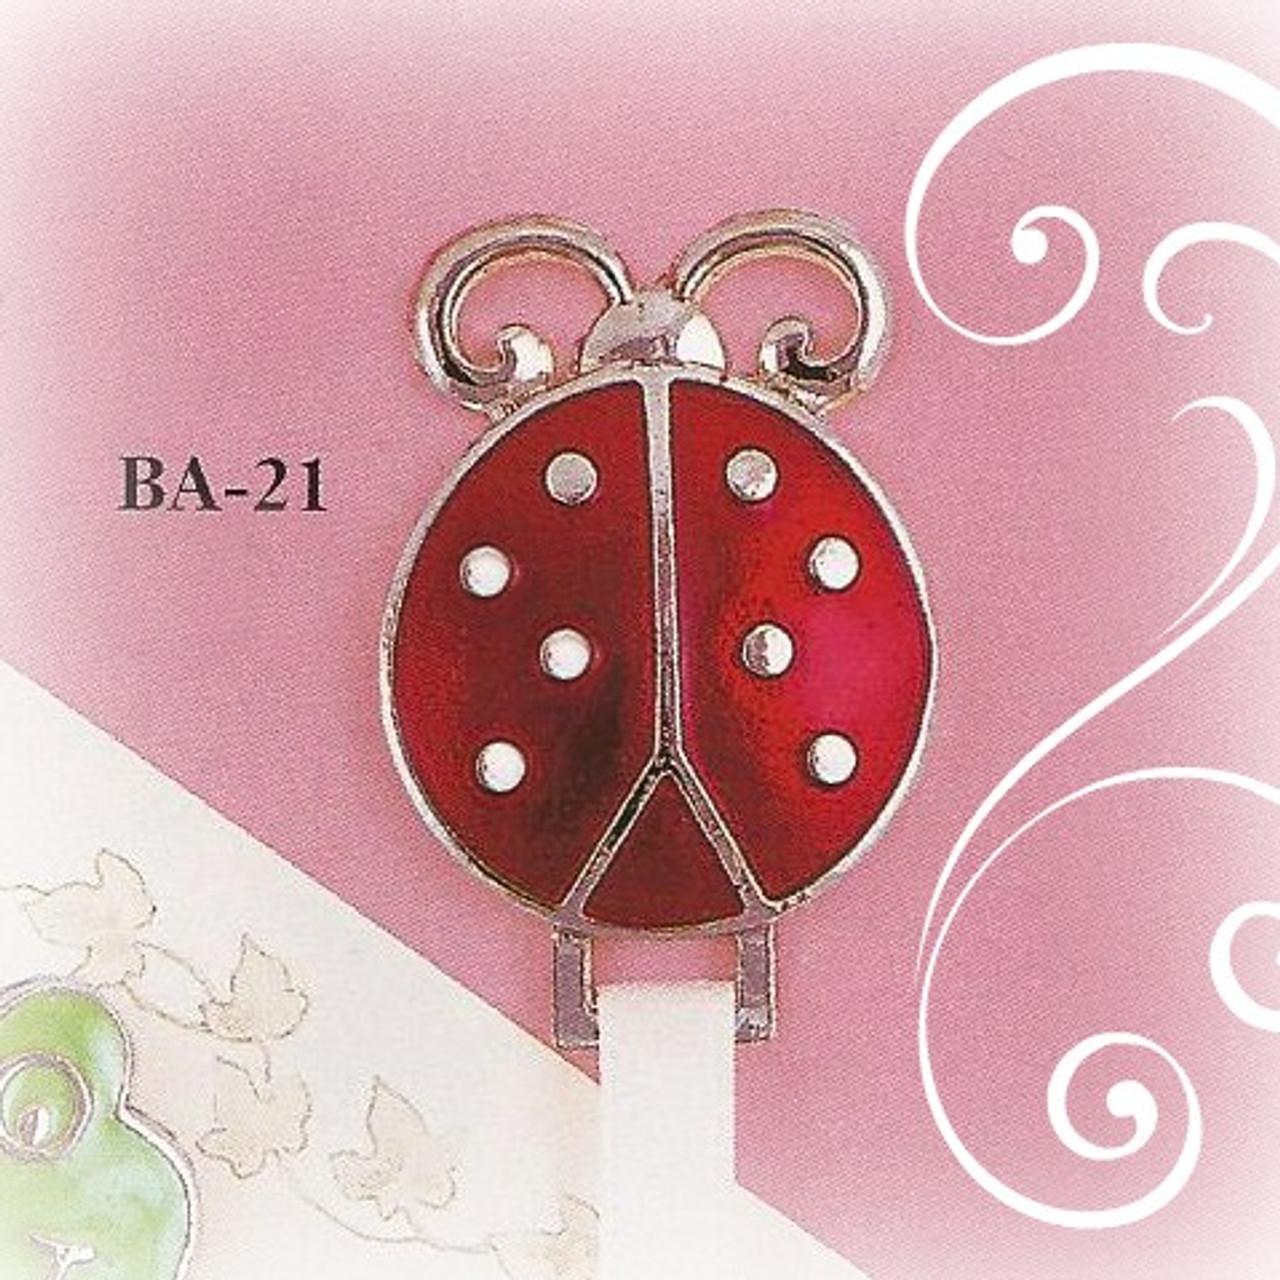 BA-21 Red Ladybug Paci Holder